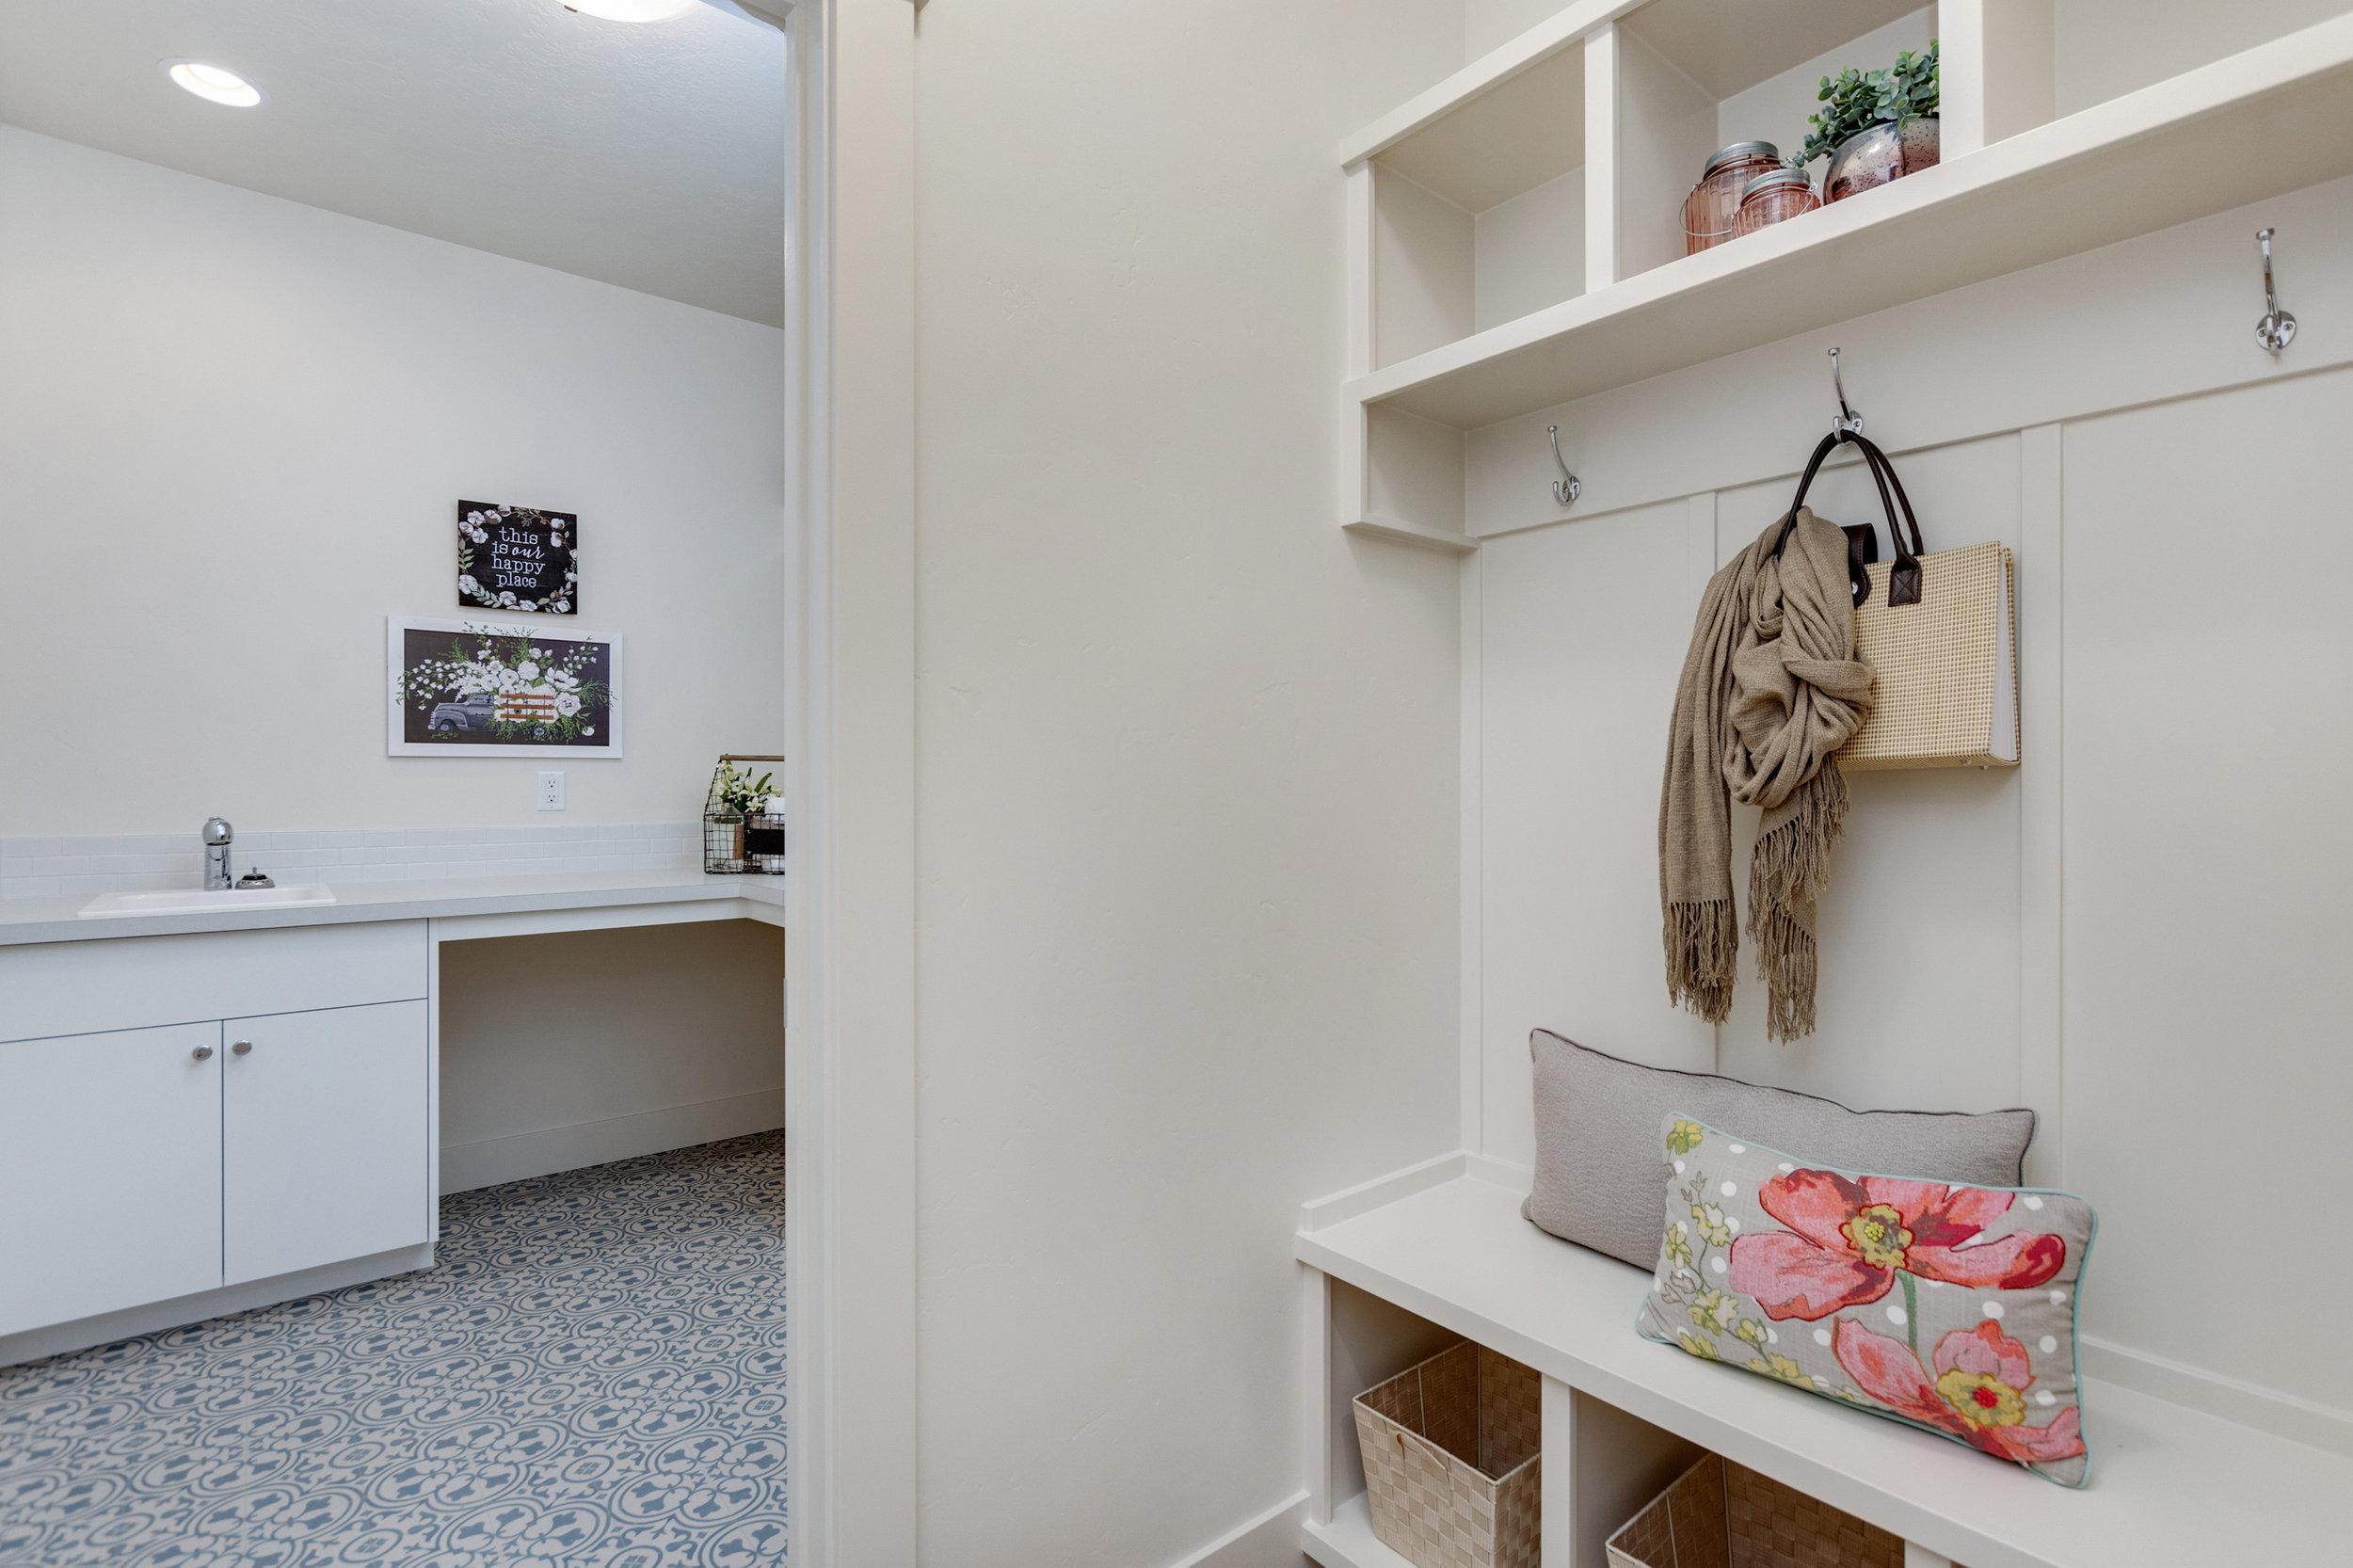 36-Laundry Room.jpg